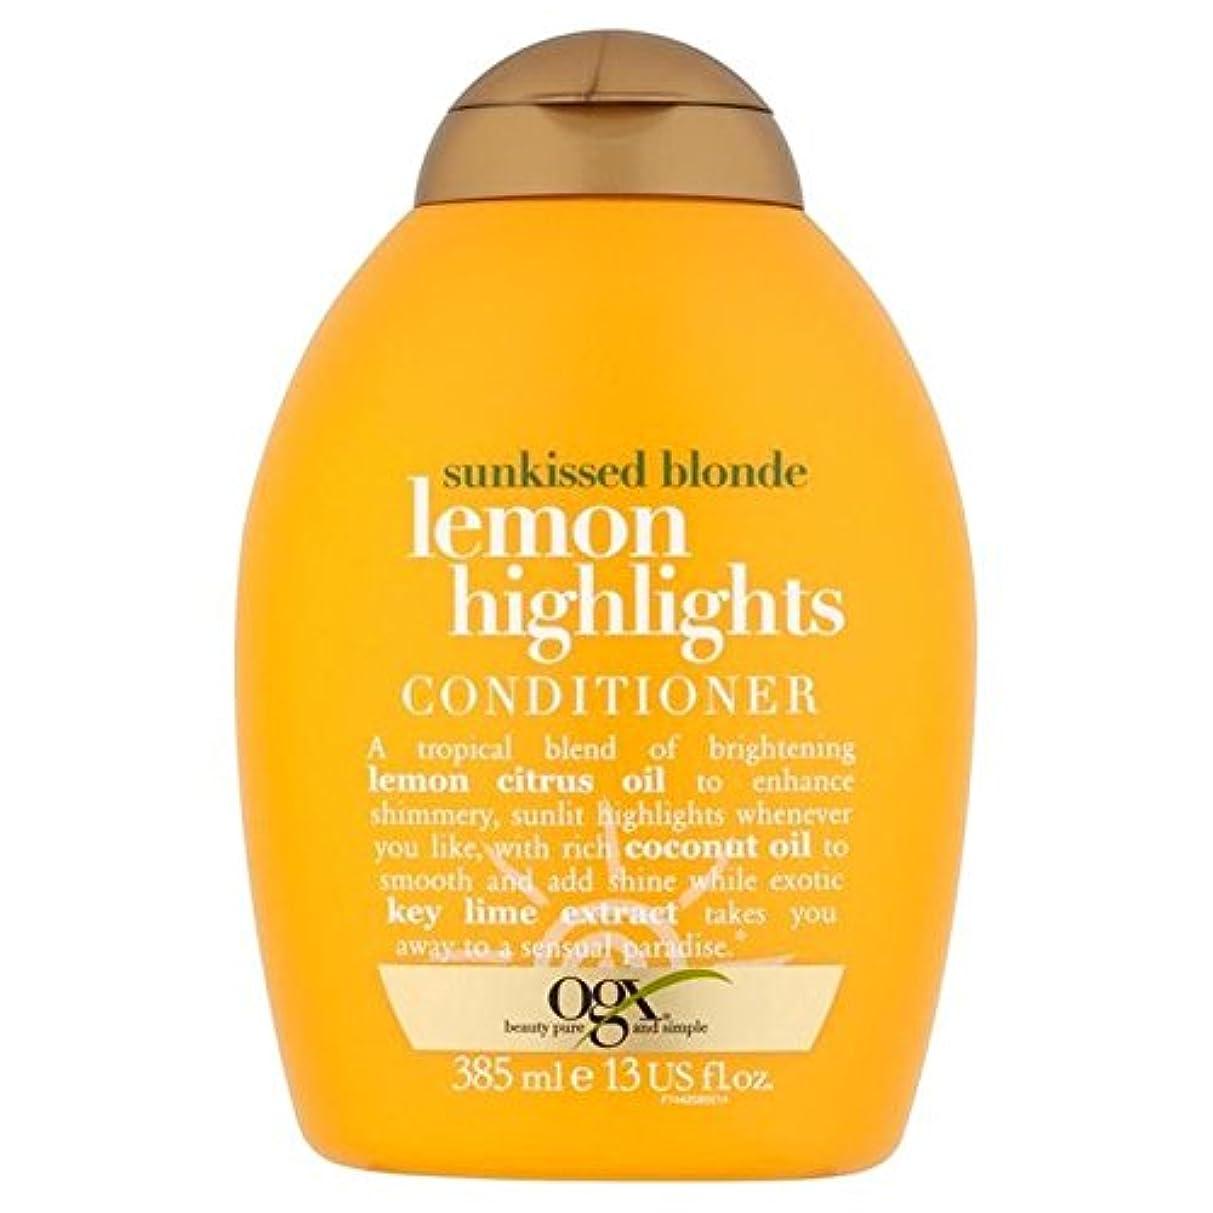 Ogx Blonde Lemon Highlights Conditioner 385ml (Pack of 6) - ブロンドレモンハイライトコンディショナー385ミリリットル x6 [並行輸入品]